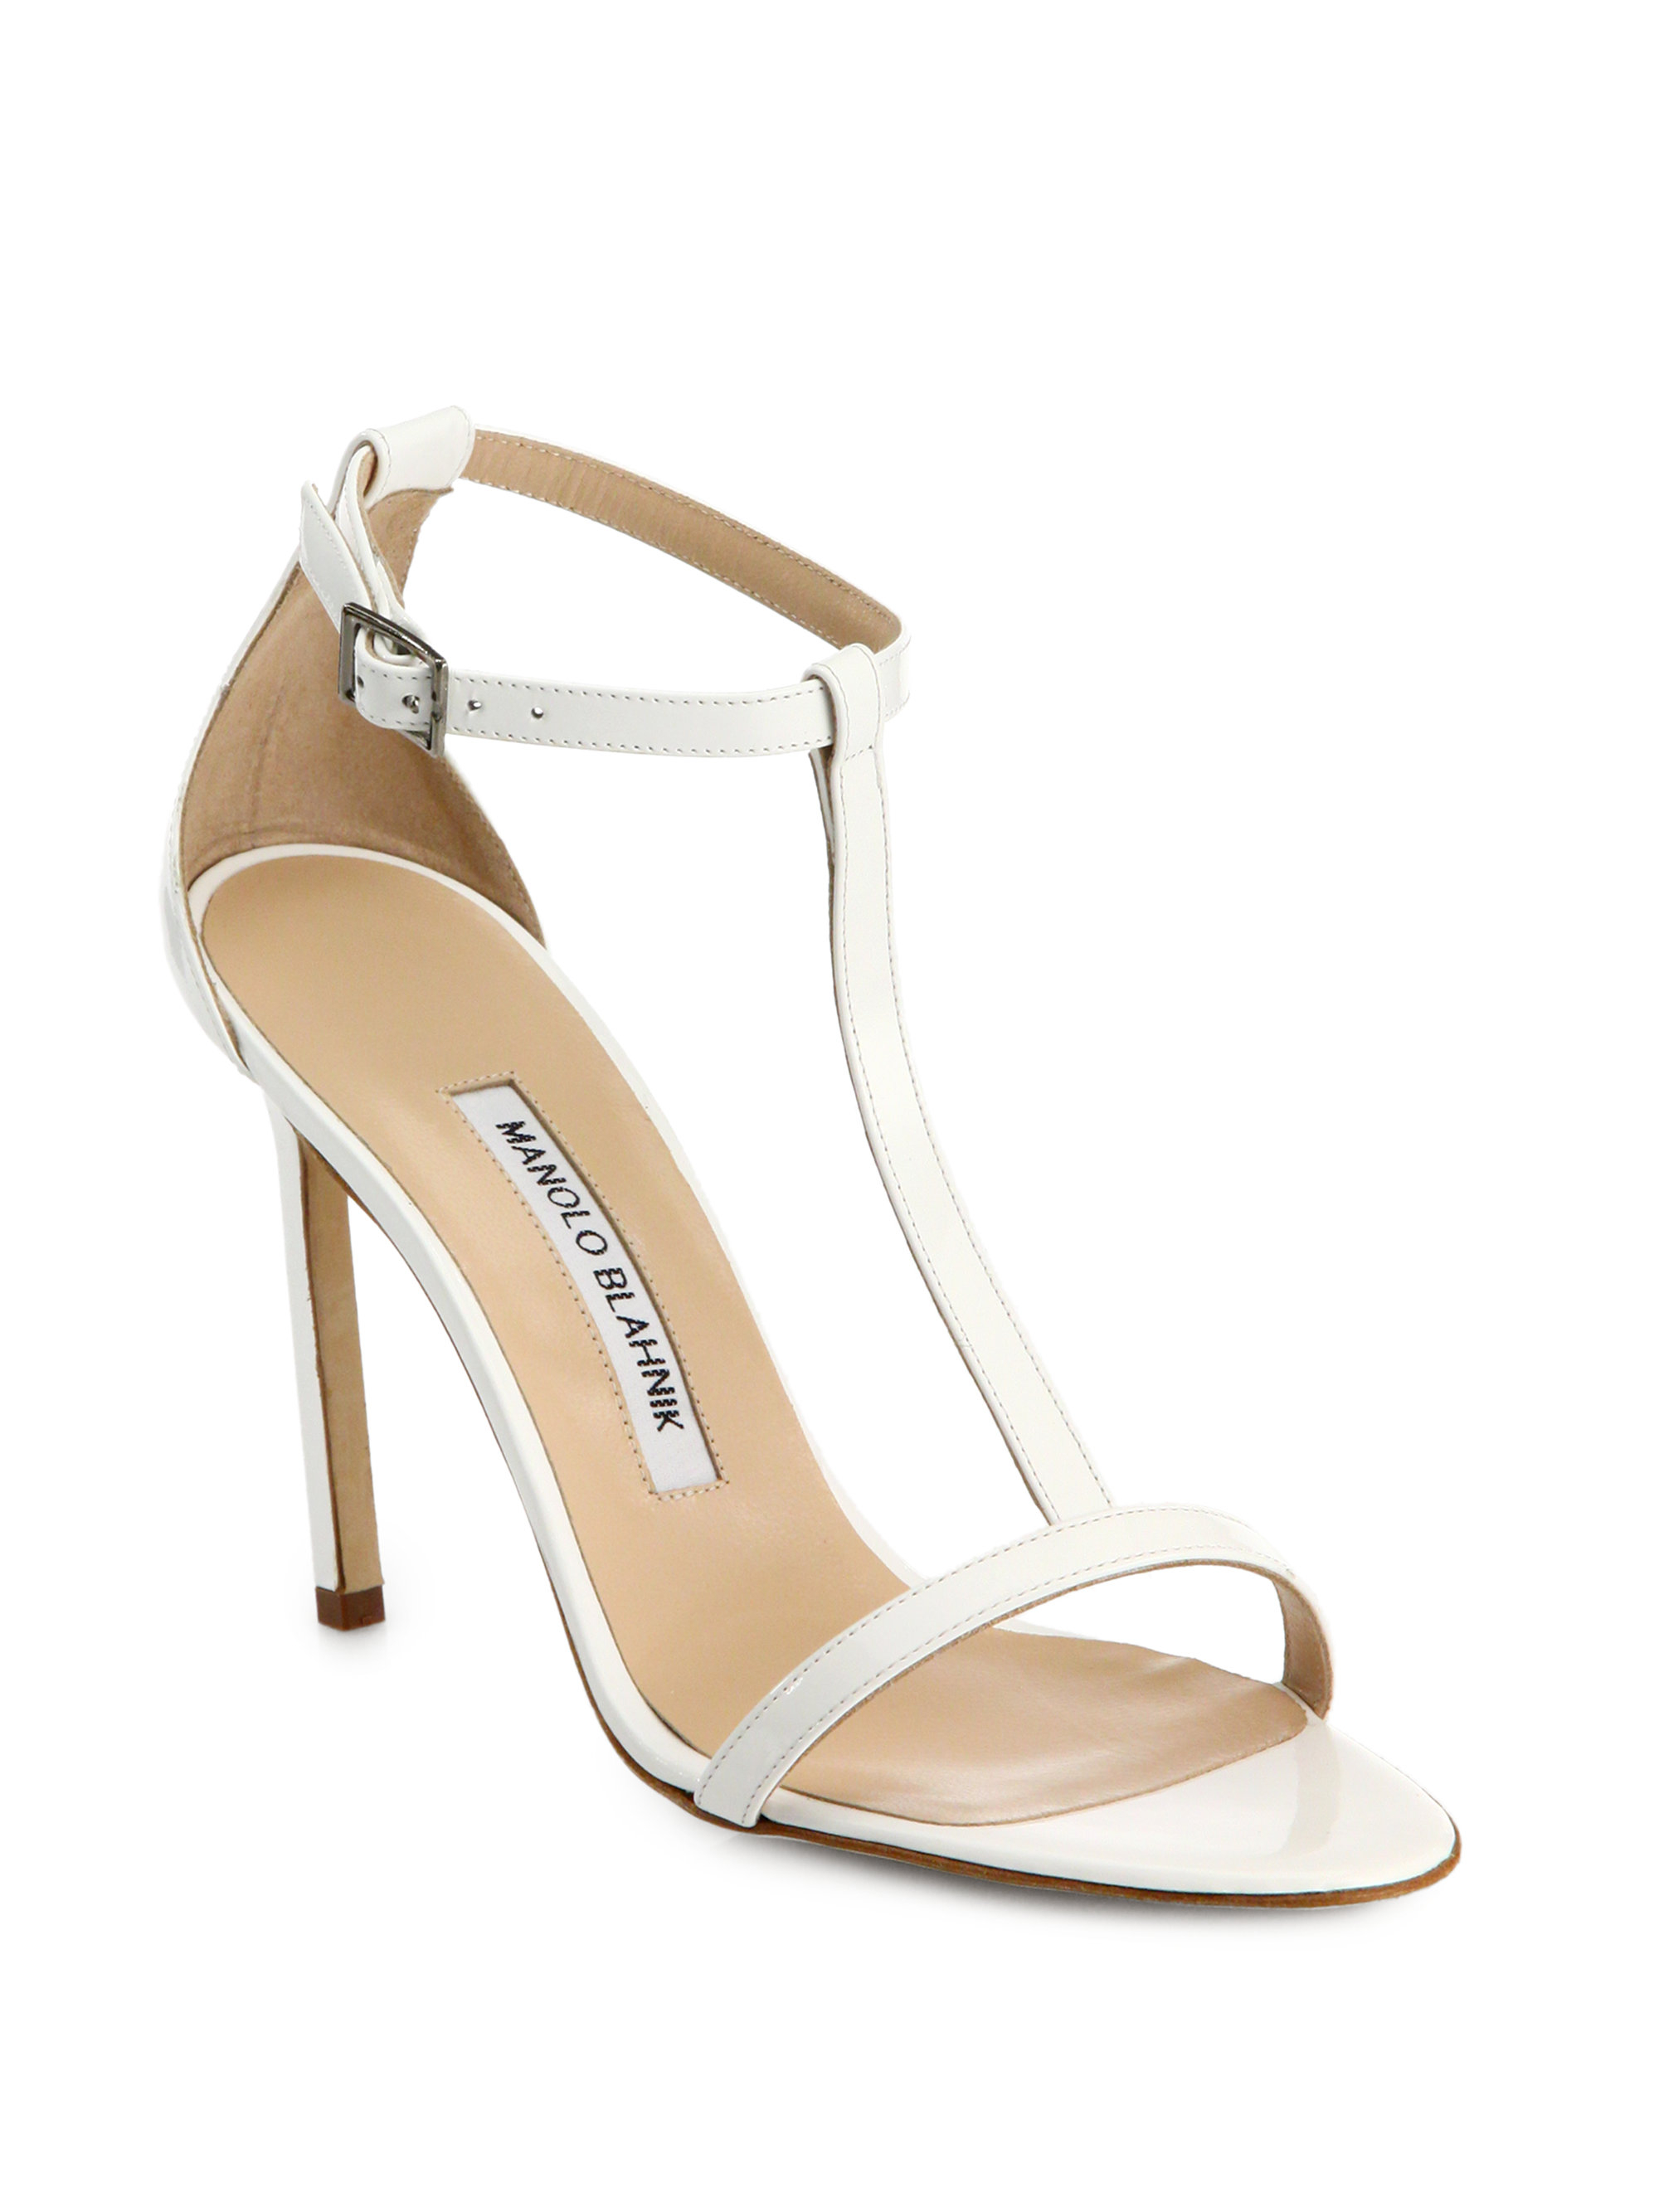 Manolo Blahnik Ruffle-Trimmed T-Strap Sandals outlet store sale online discount fashionable gIpzNe